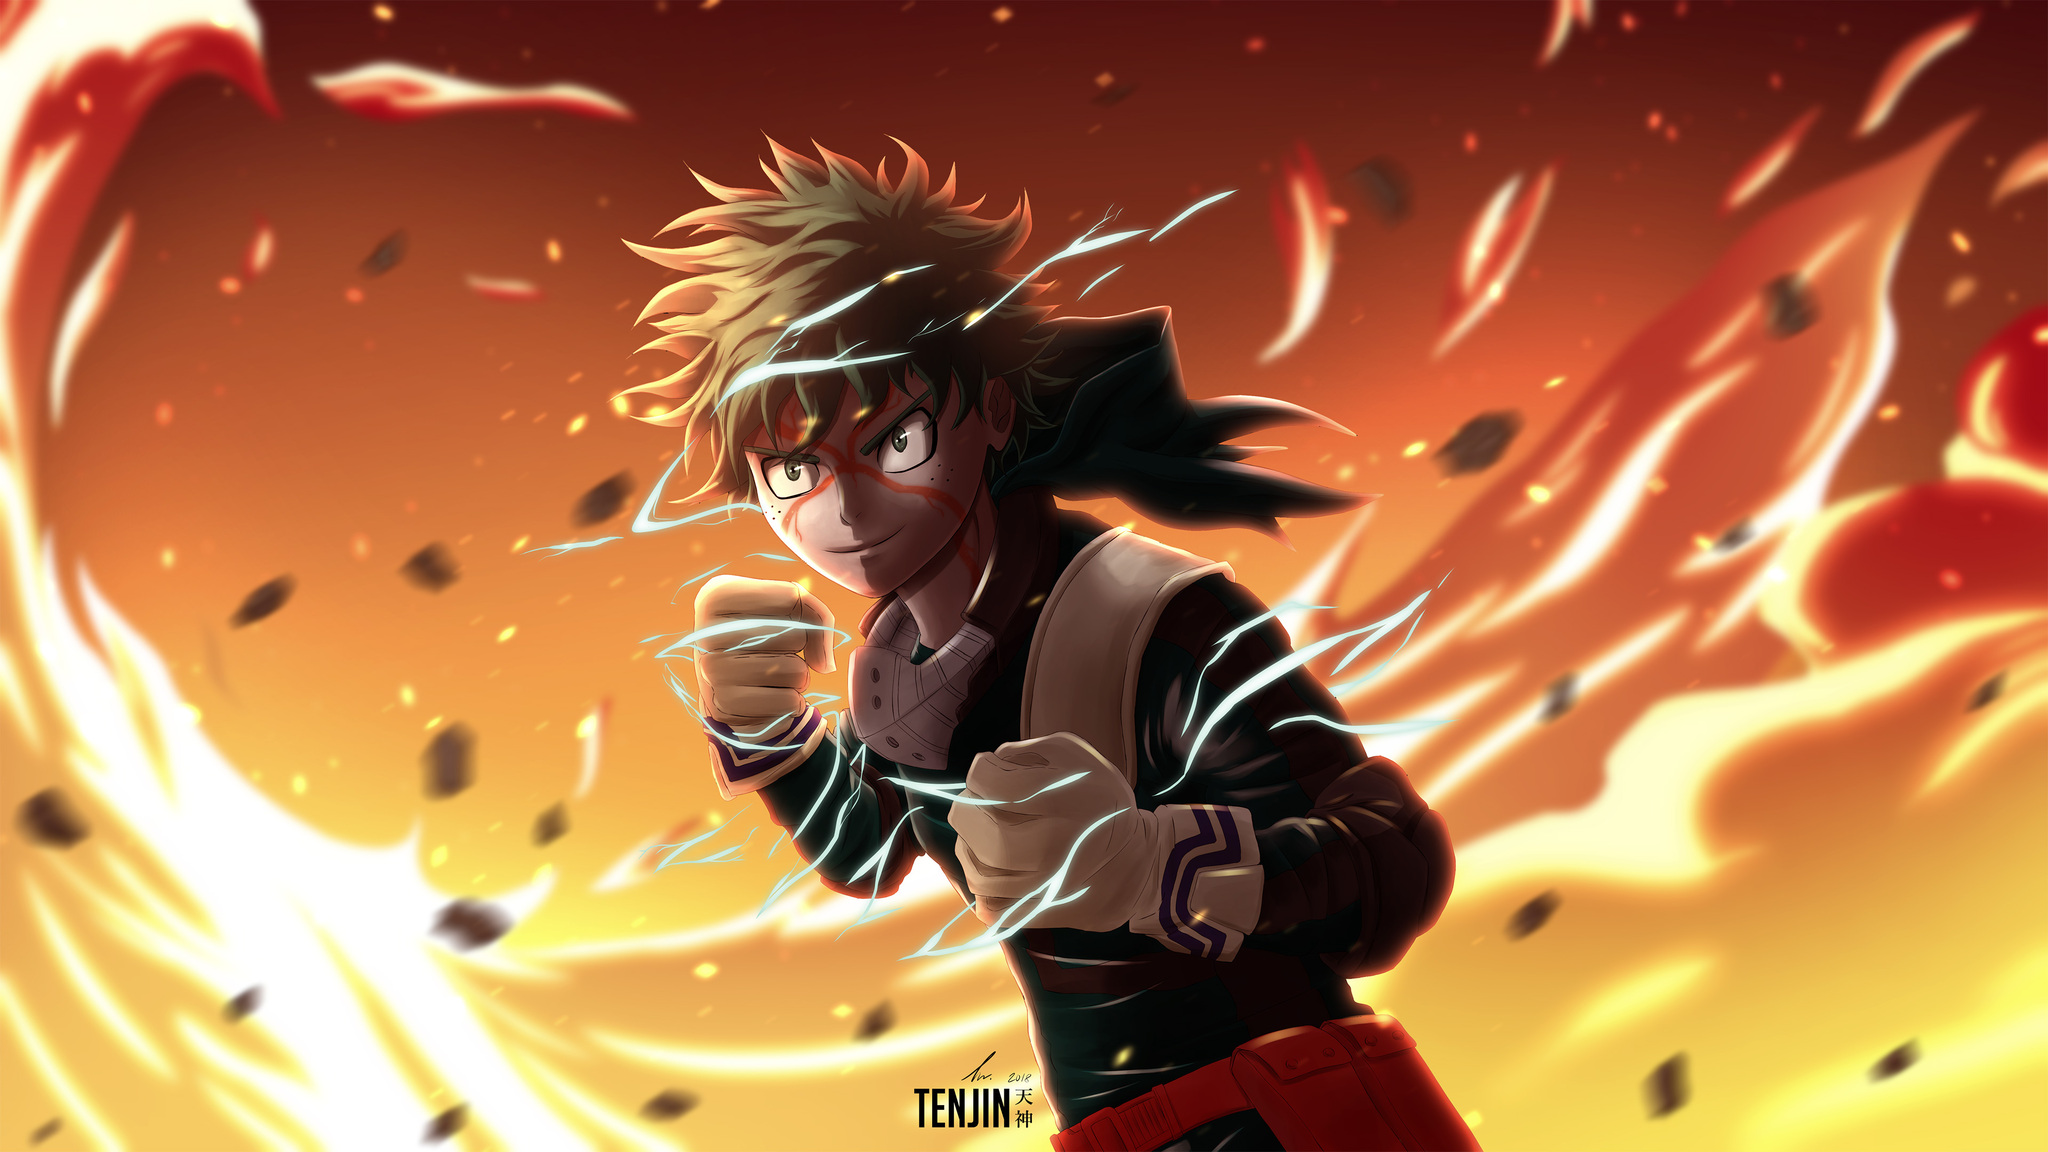 2048x1152 My Hero Academia Izuku Midoriya 4k 2048x1152